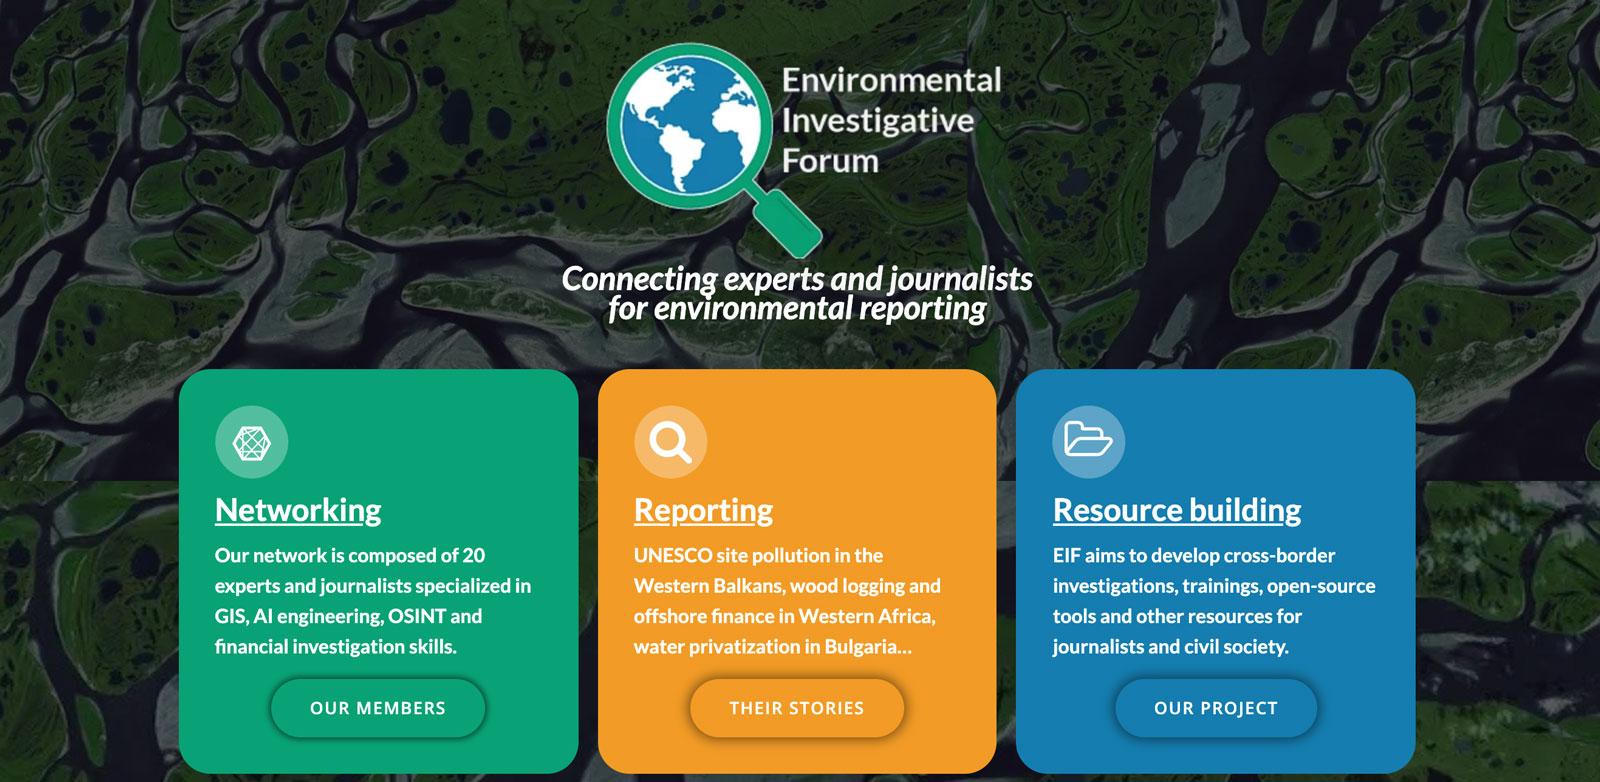 Environmental Investigative Forum